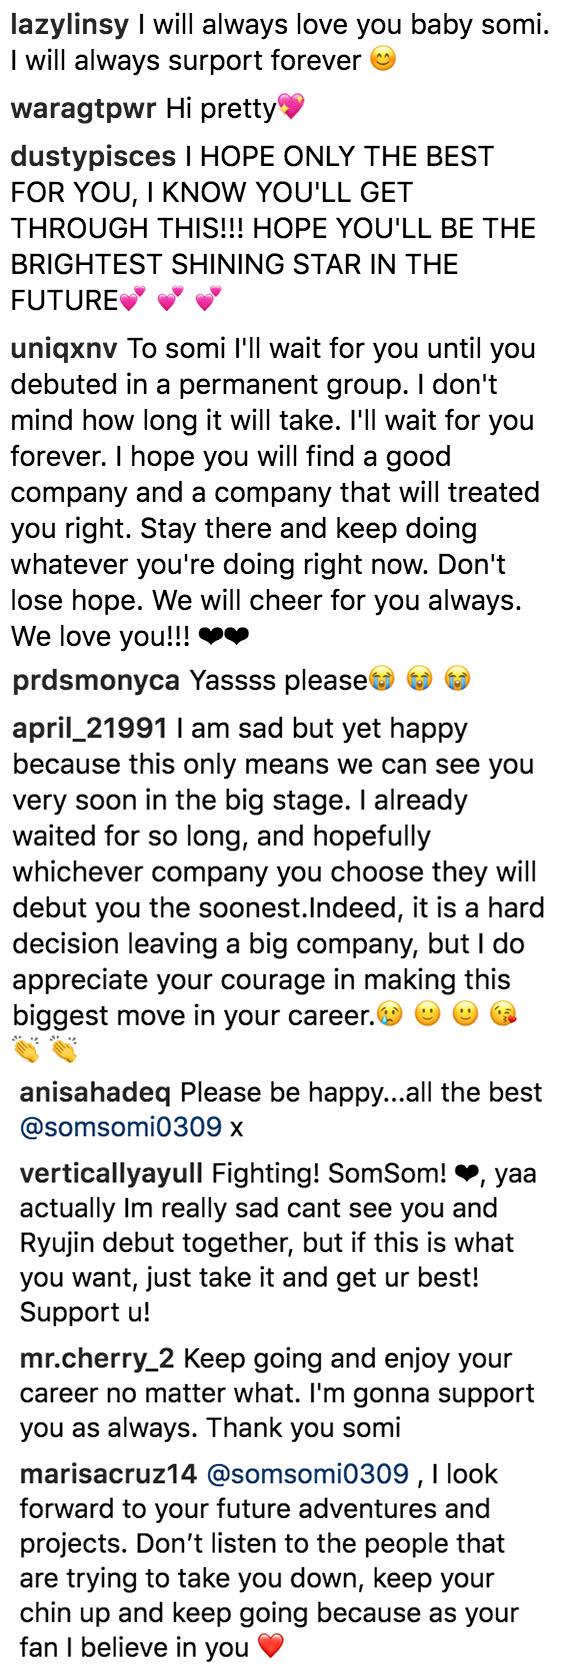 somi instagram fans support